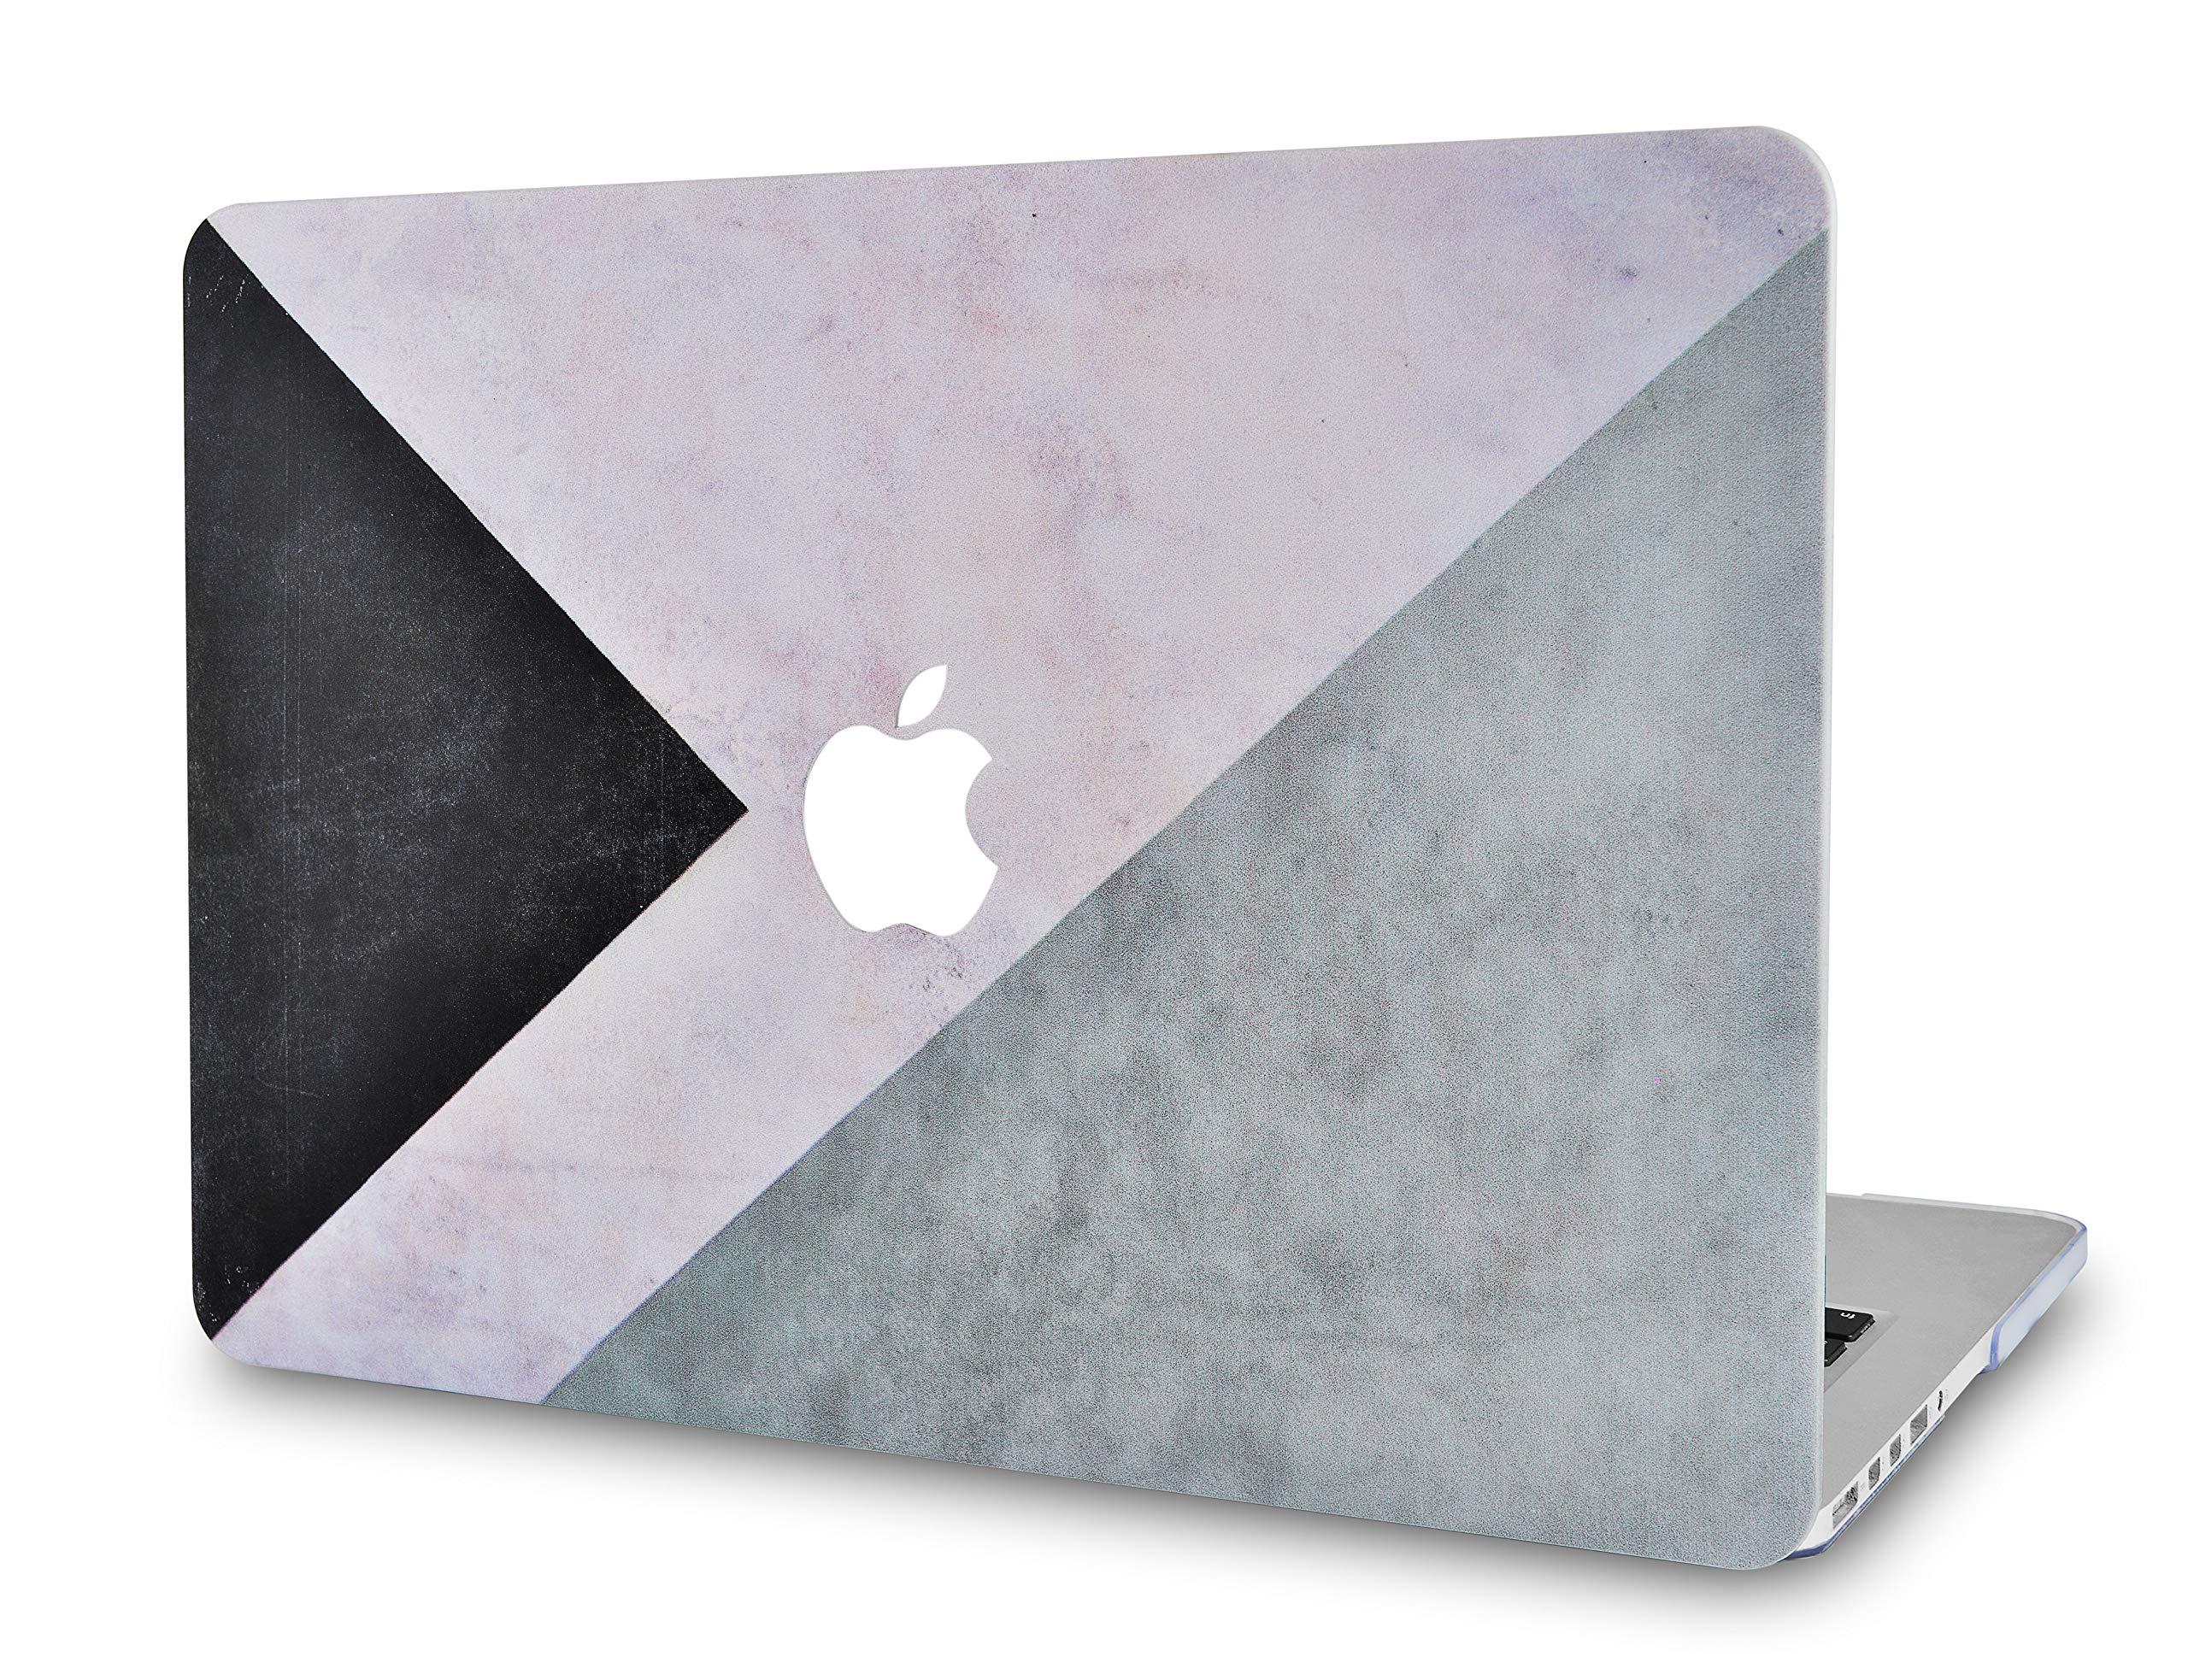 "LuvCaseLaptopCaseforOld MacBook Pro 13"" Retina Display (2015/2014/2013/2012 Release) A1502/A1425RubberizedPlasticHardShellCover (Black White Grey)"